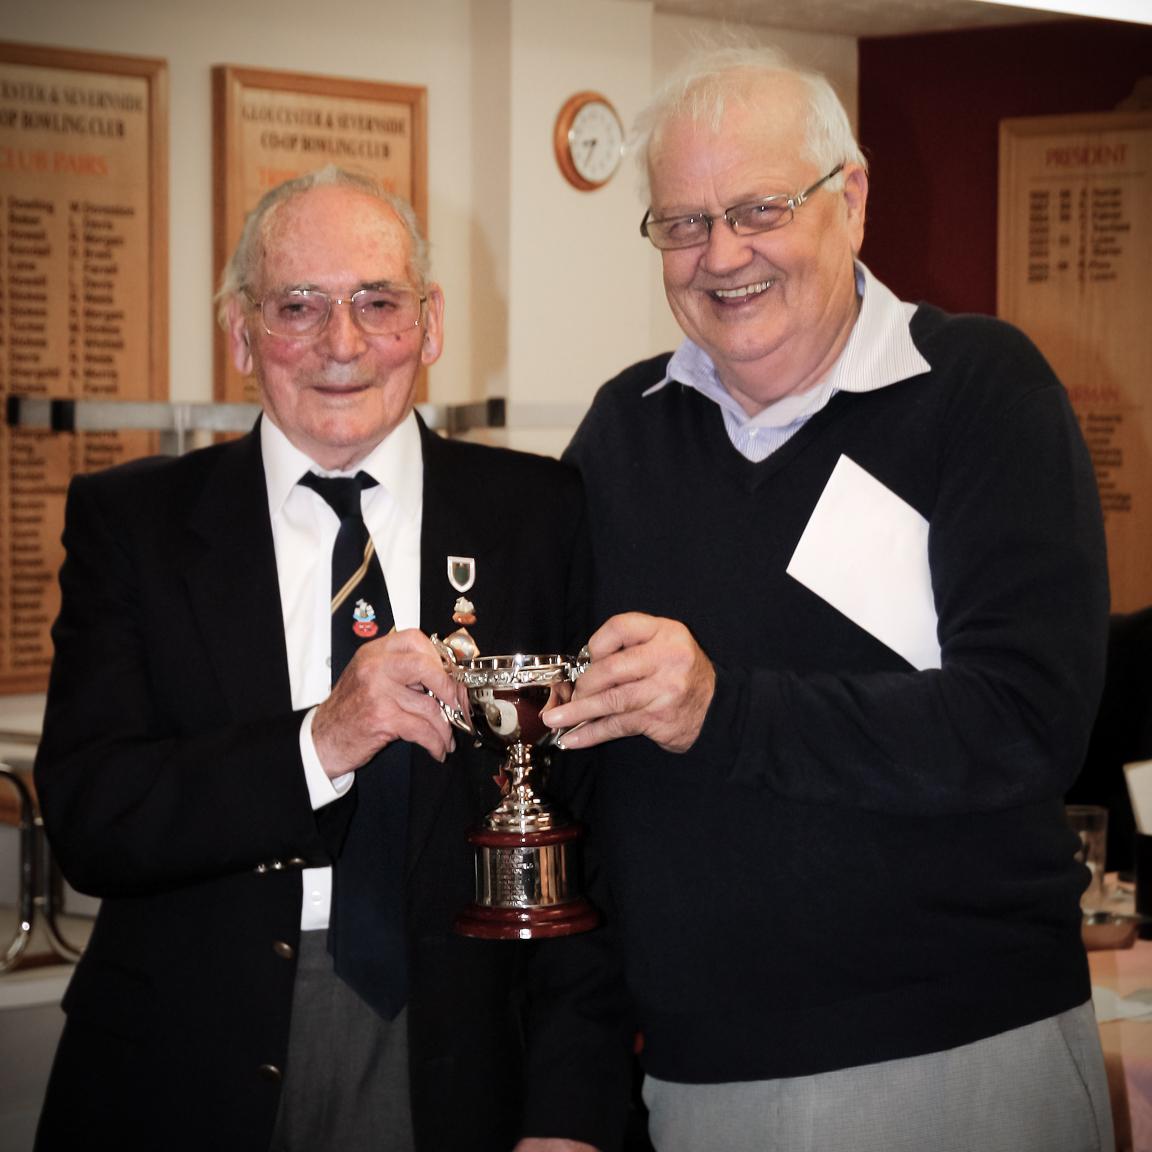 Andy Andrews Cup Winner